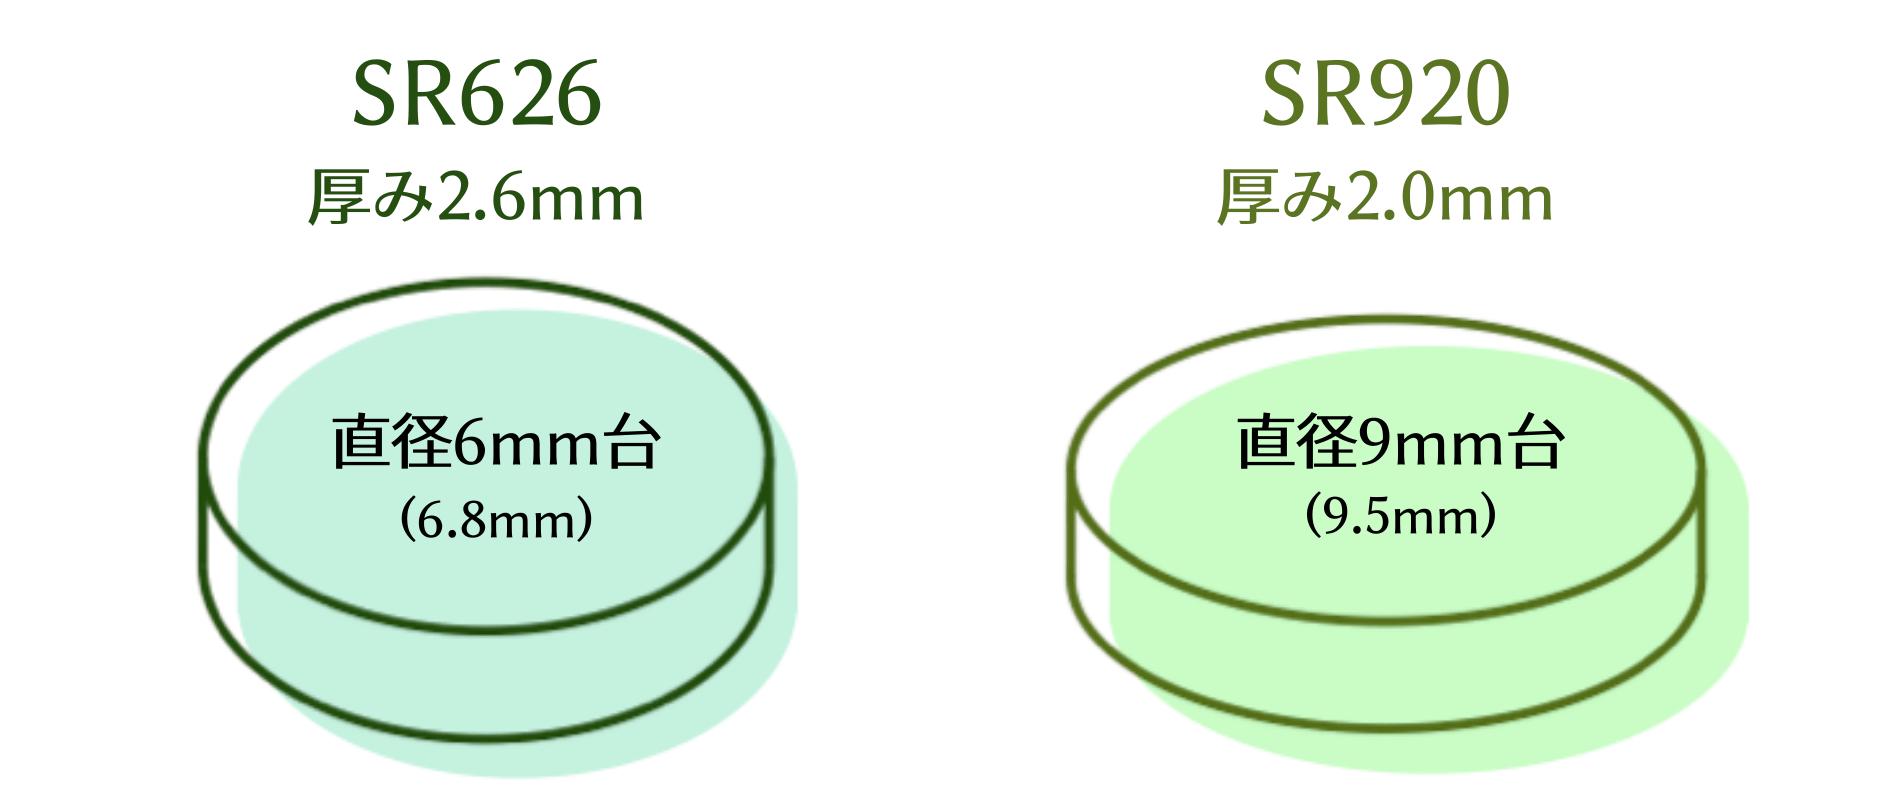 SR酸化銀電池のサイズ比較